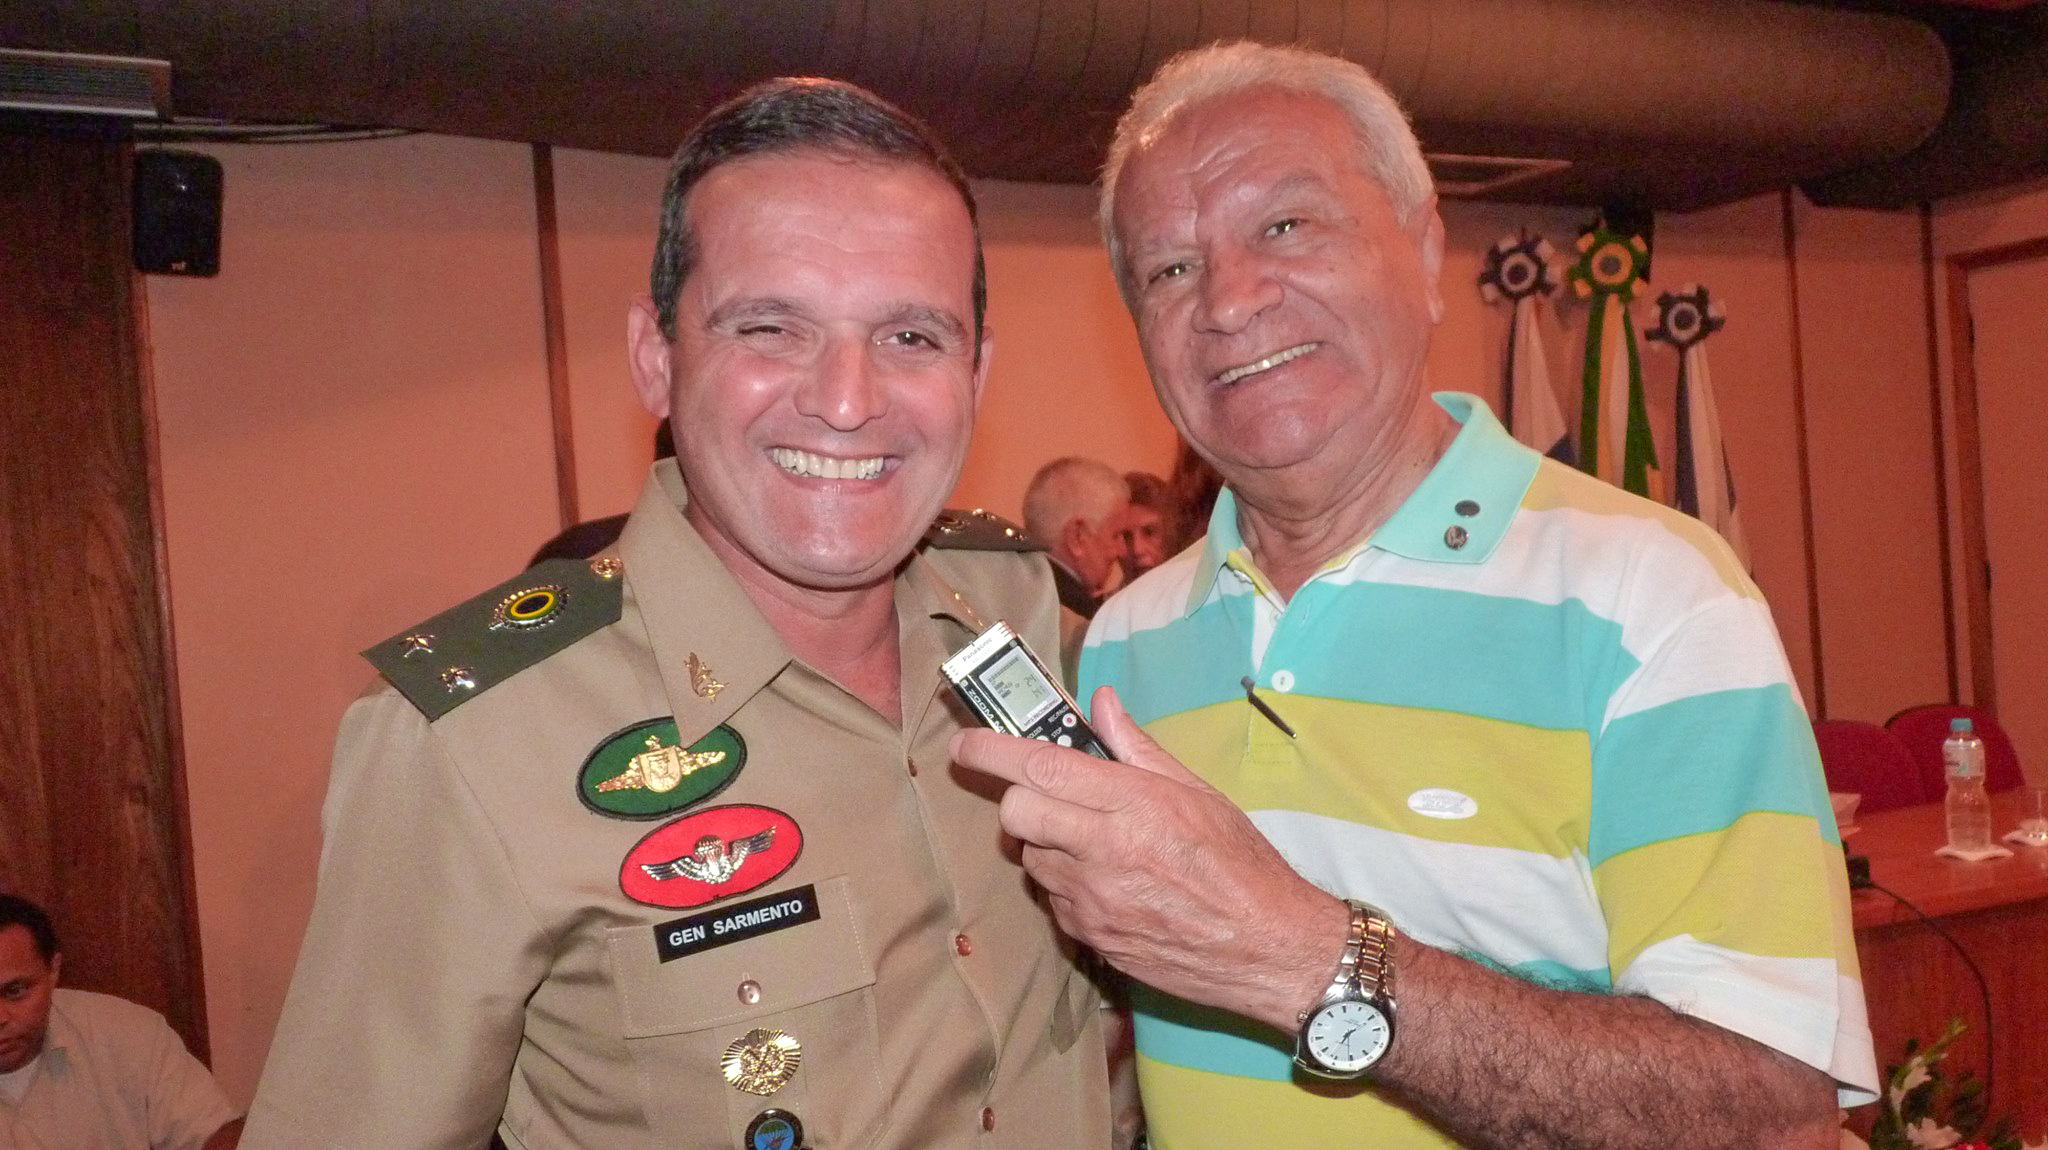 Coronel Sarmento